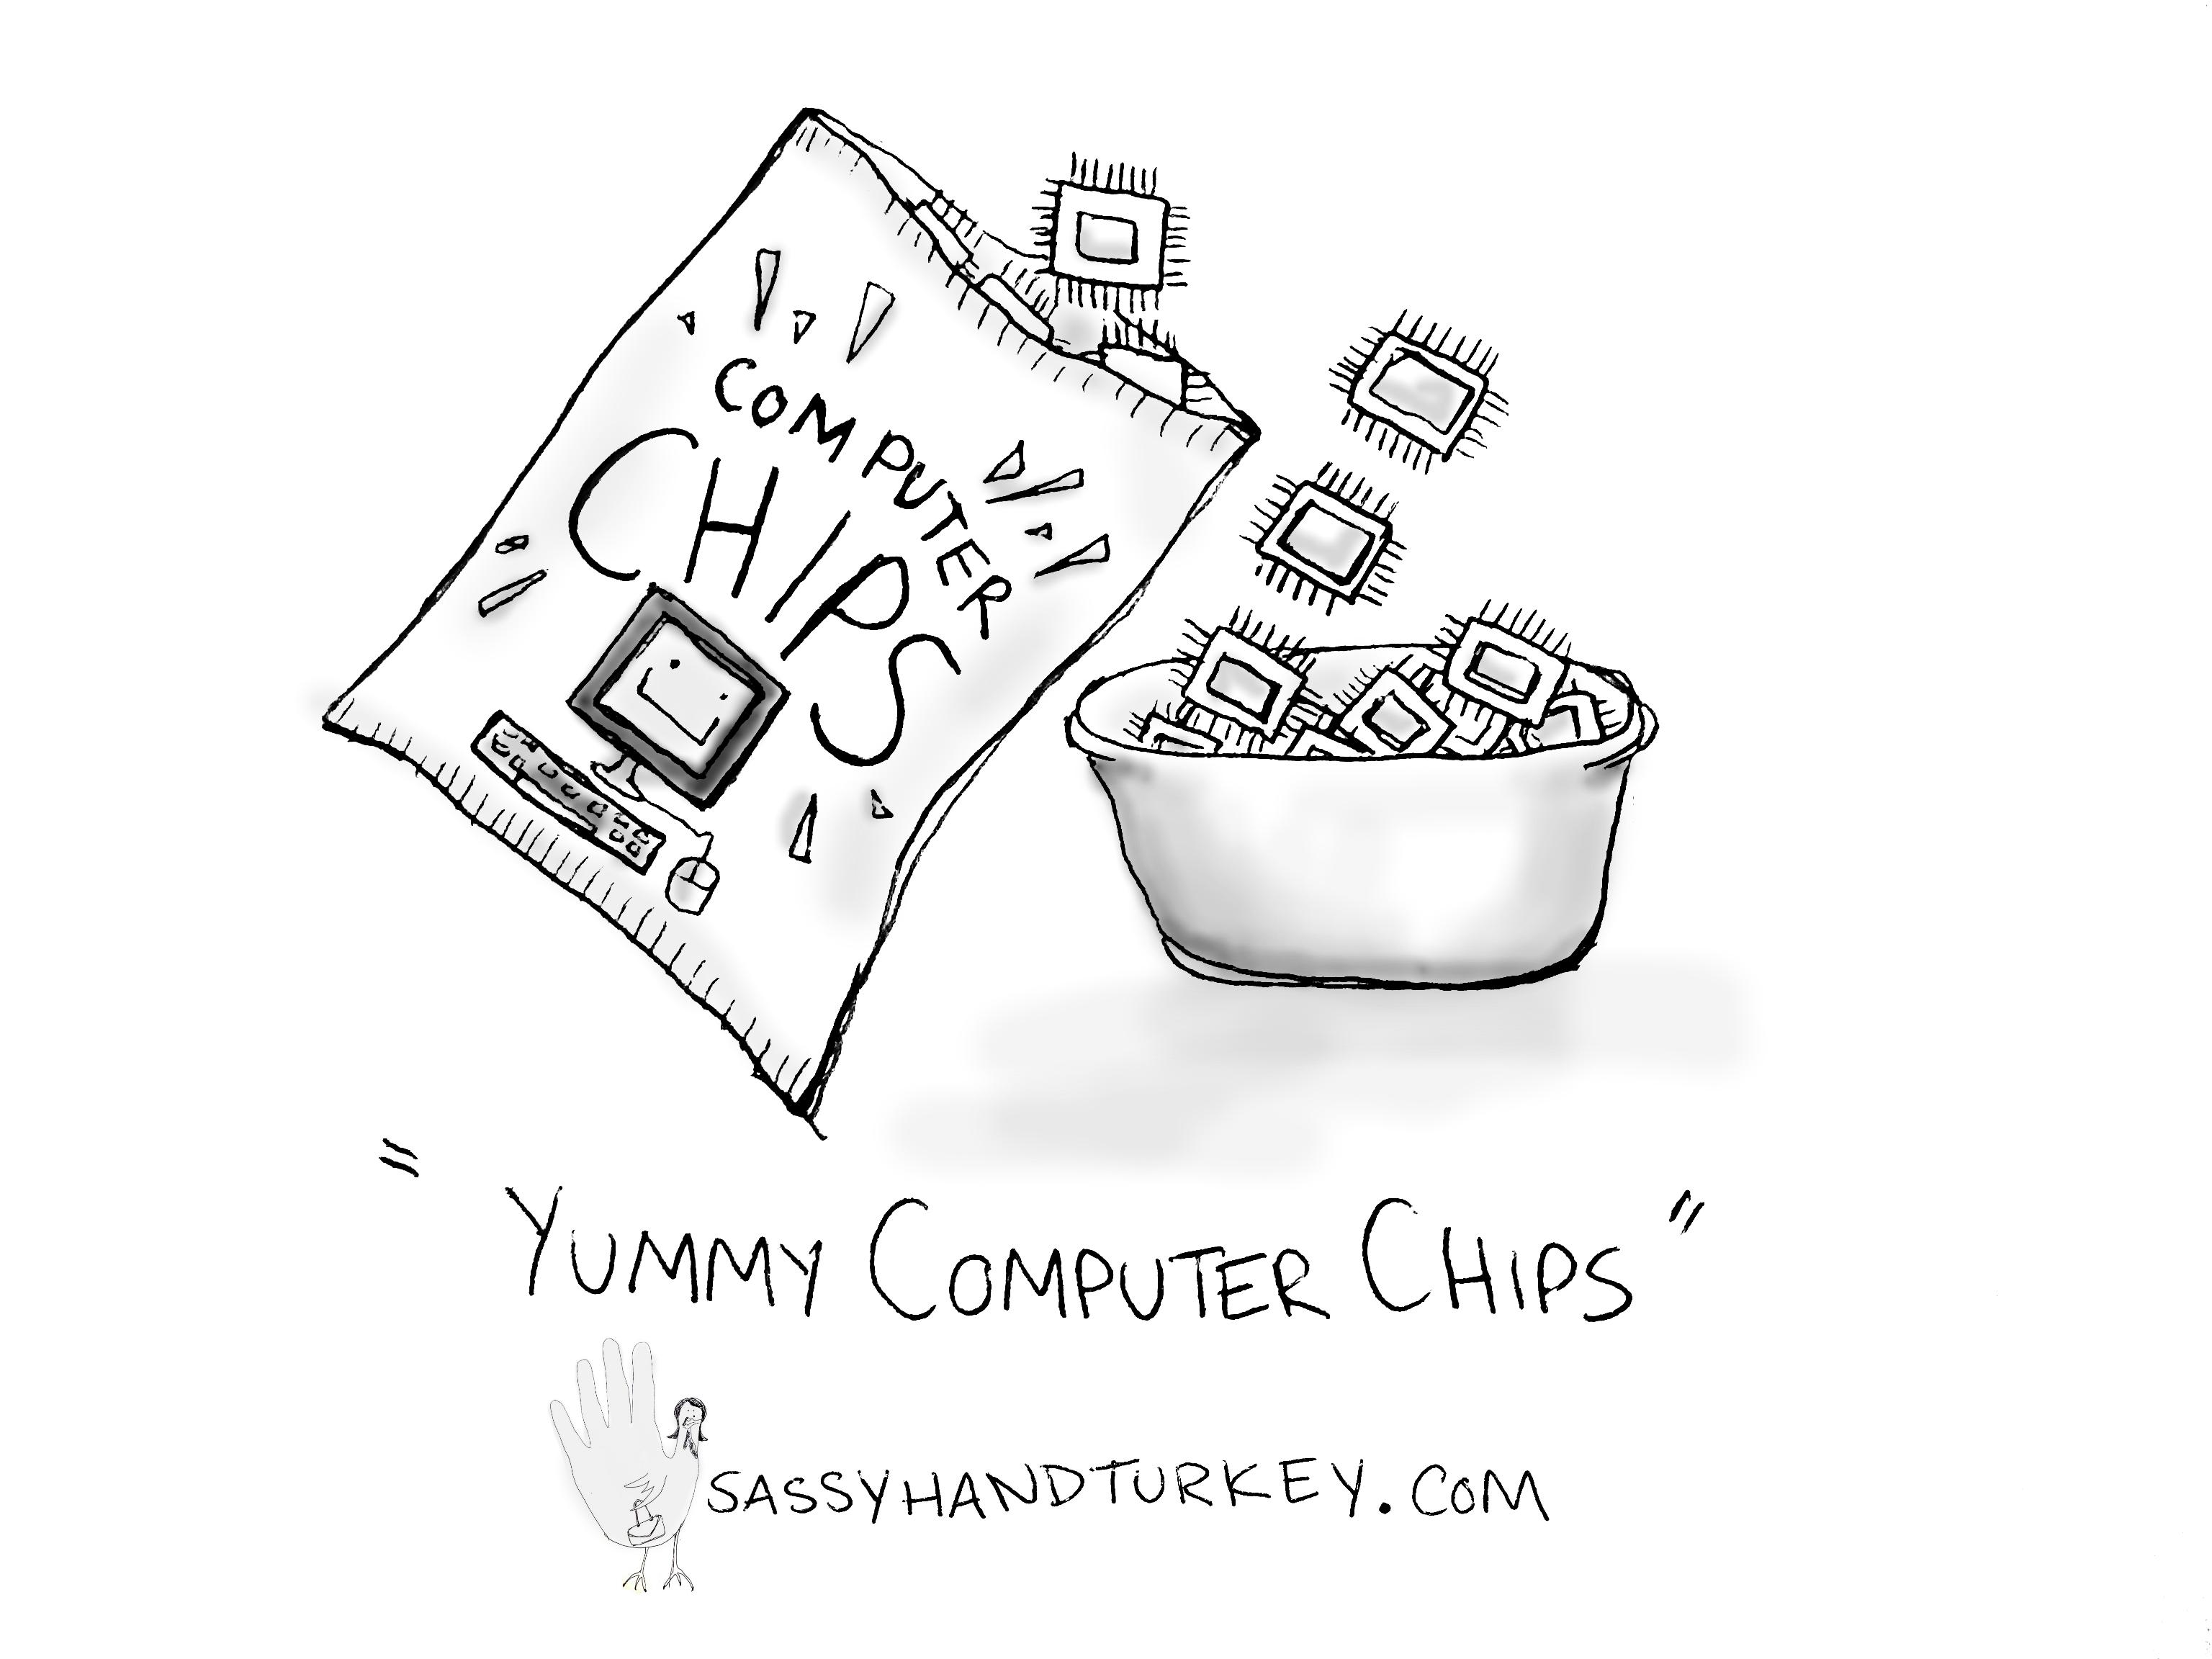 3072x2304 Yummy Computer Chips Sassy Hand Turkey